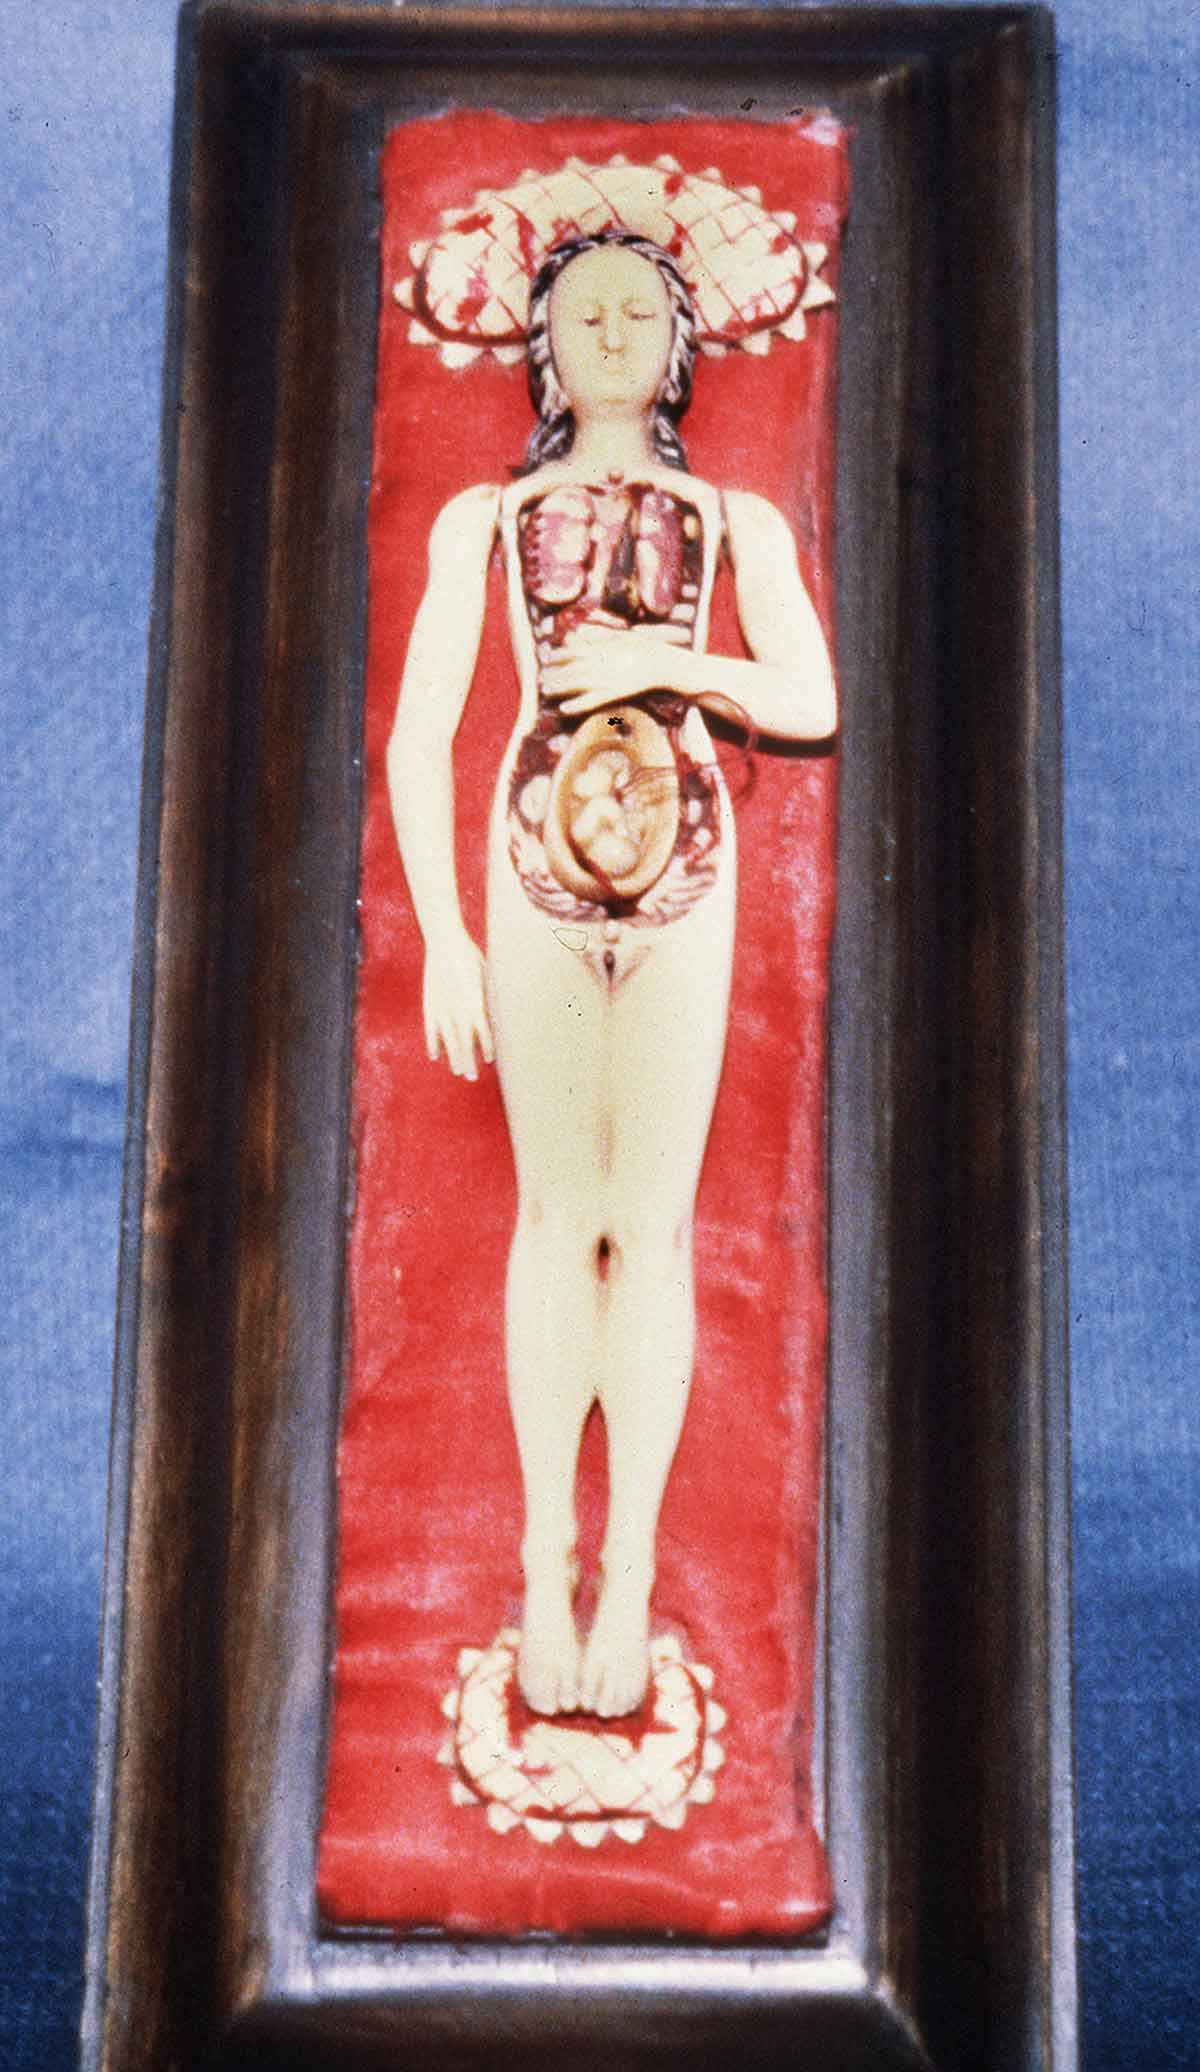 Dream Anatomy Gallery Anatomical Manikin 1